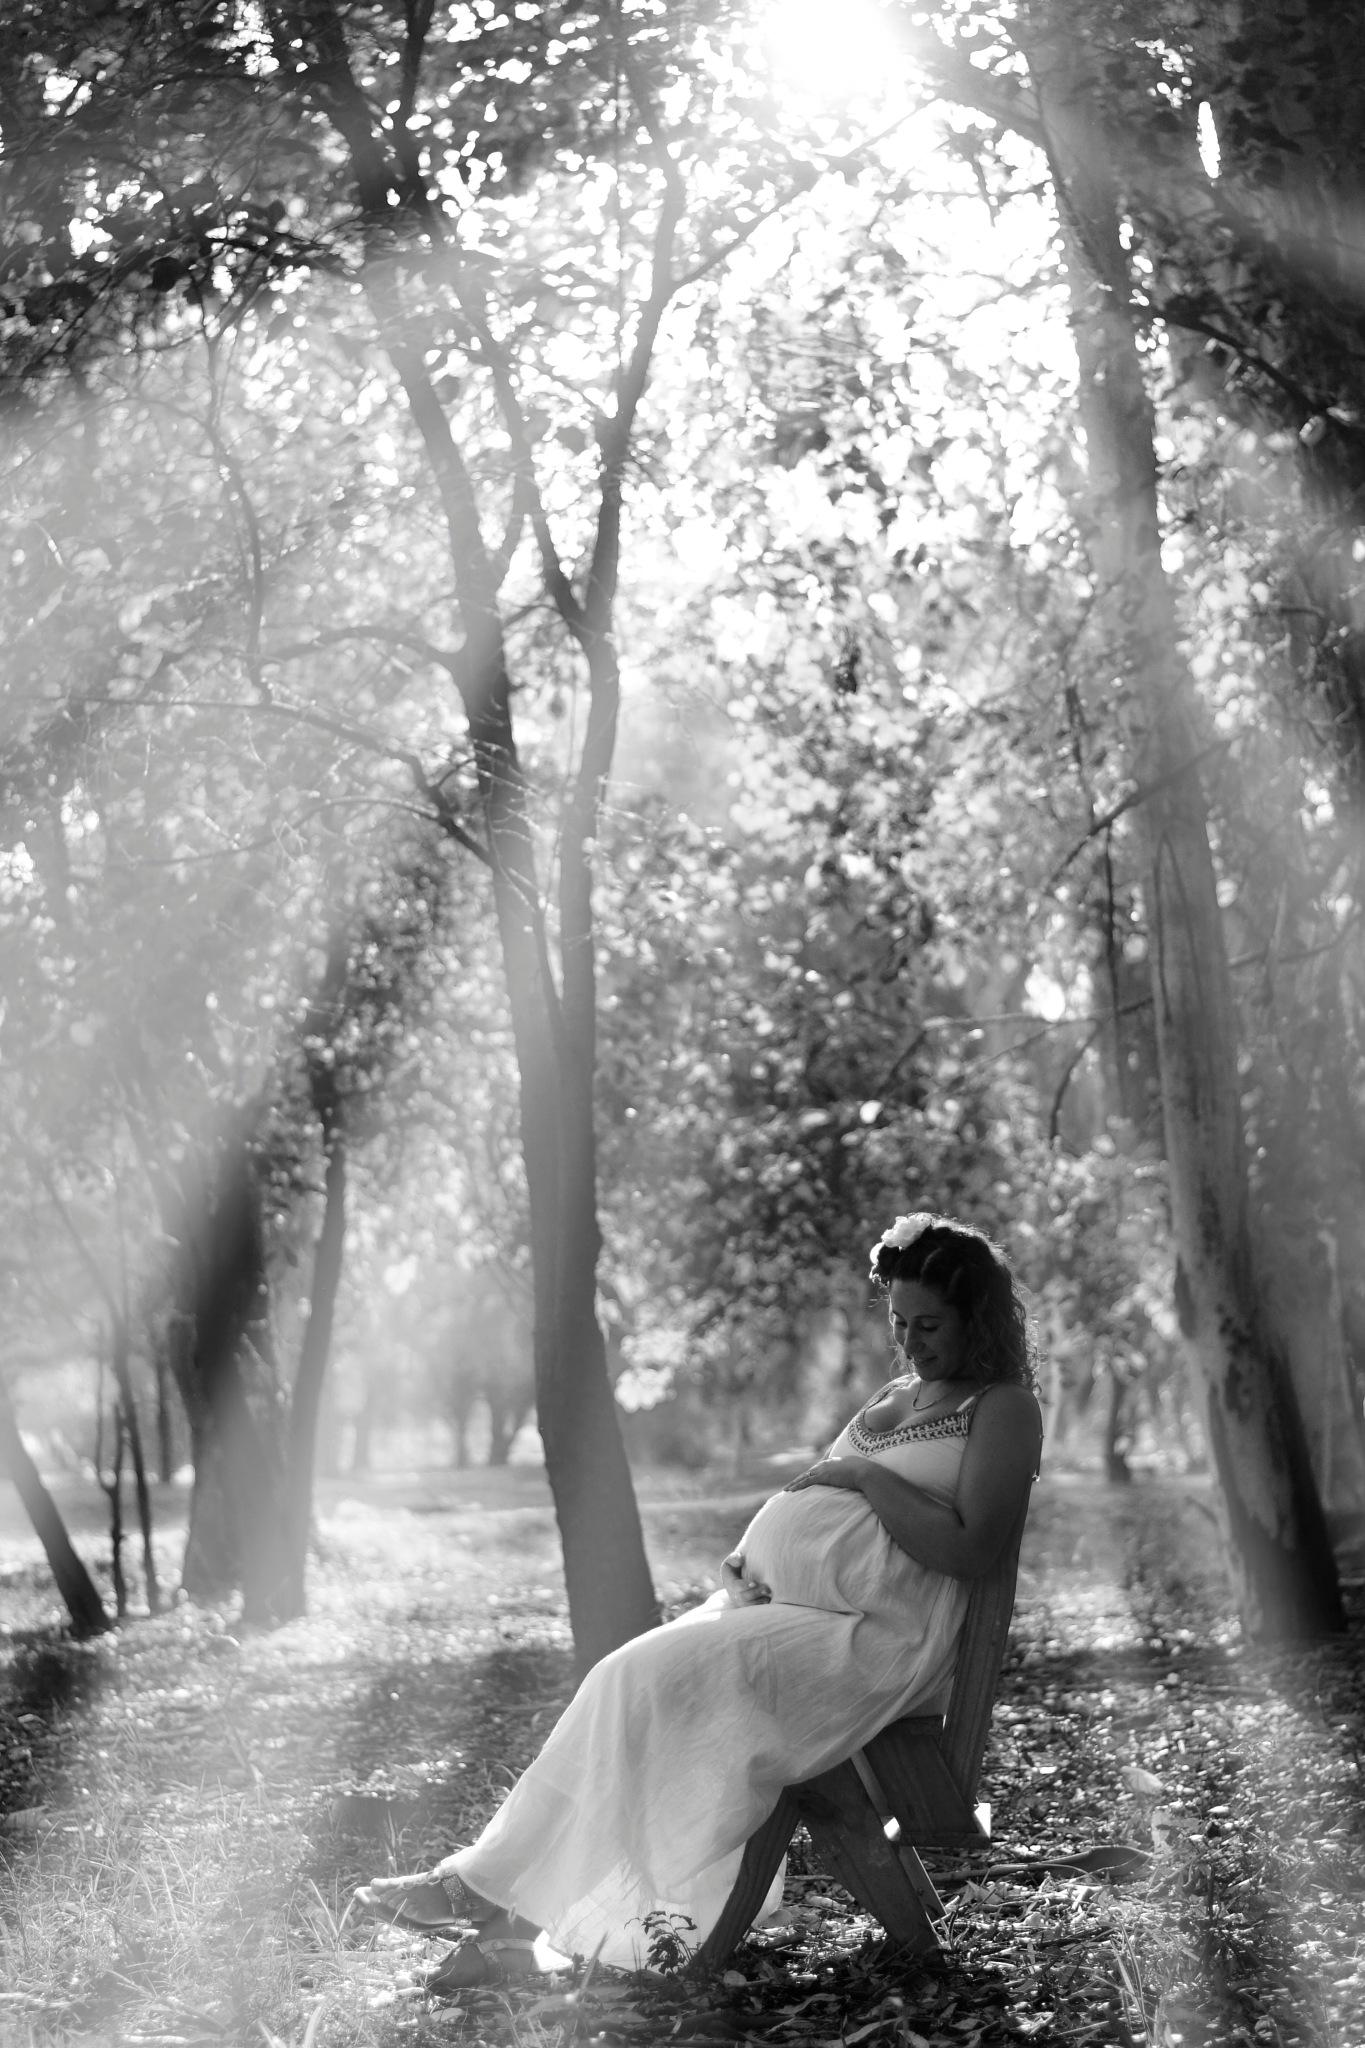 LUZ by Georgina Carrieri